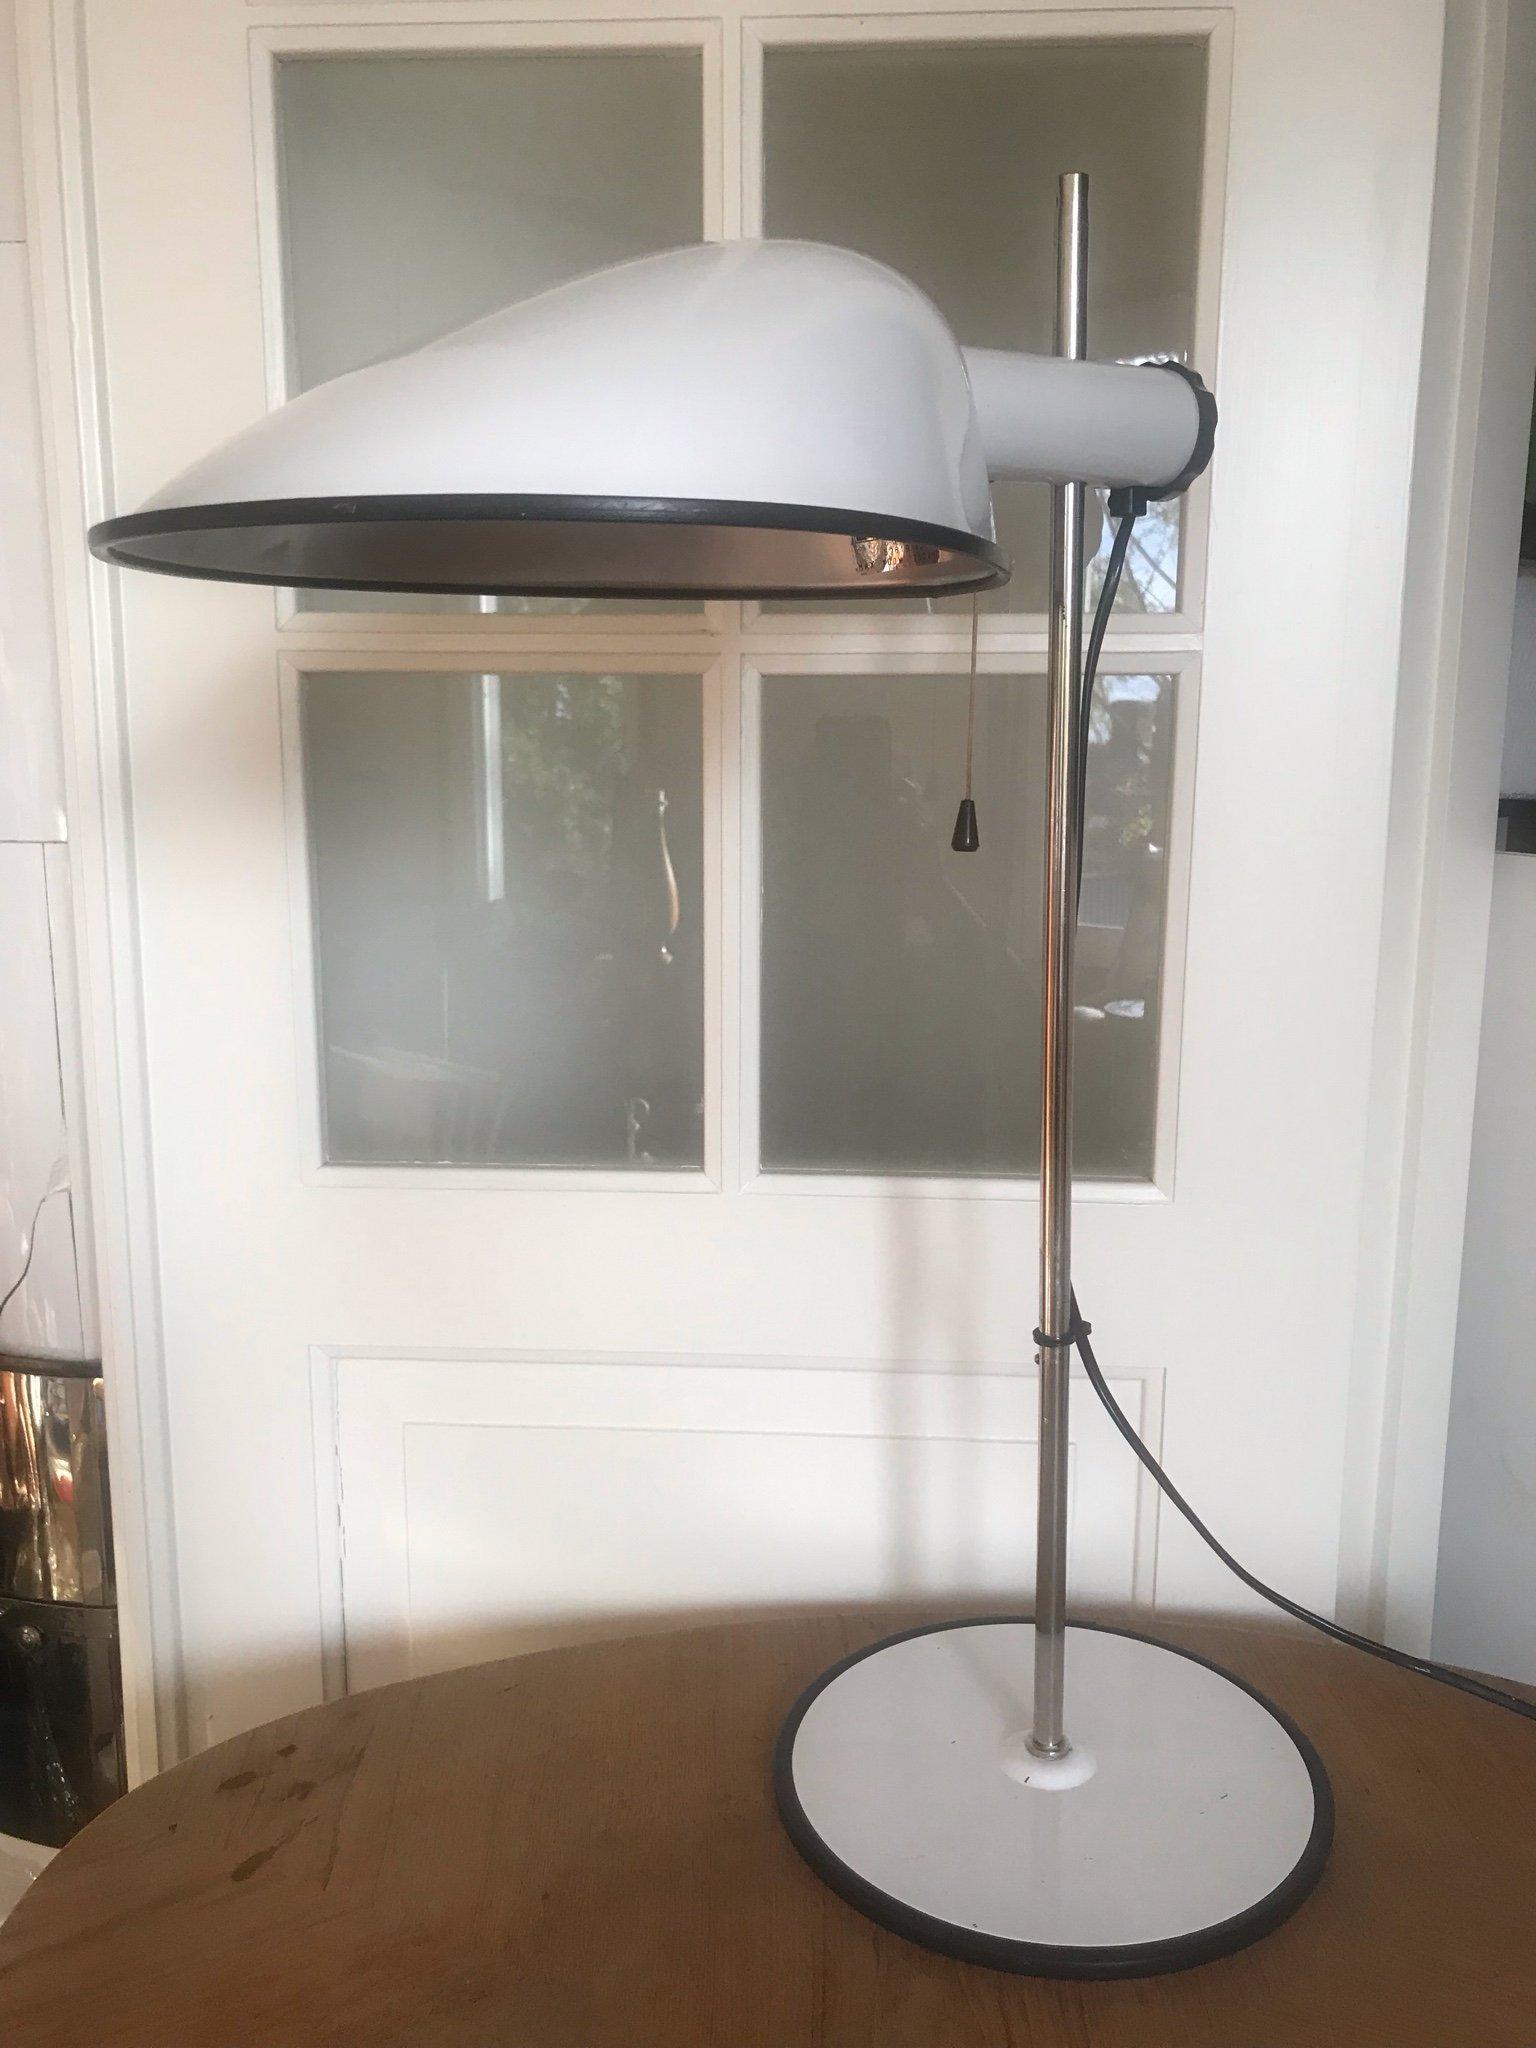 Bordslampa Lampa Skrivbordslampa Fagerhult Fagerhults 60 70 tal Sweden Vintage